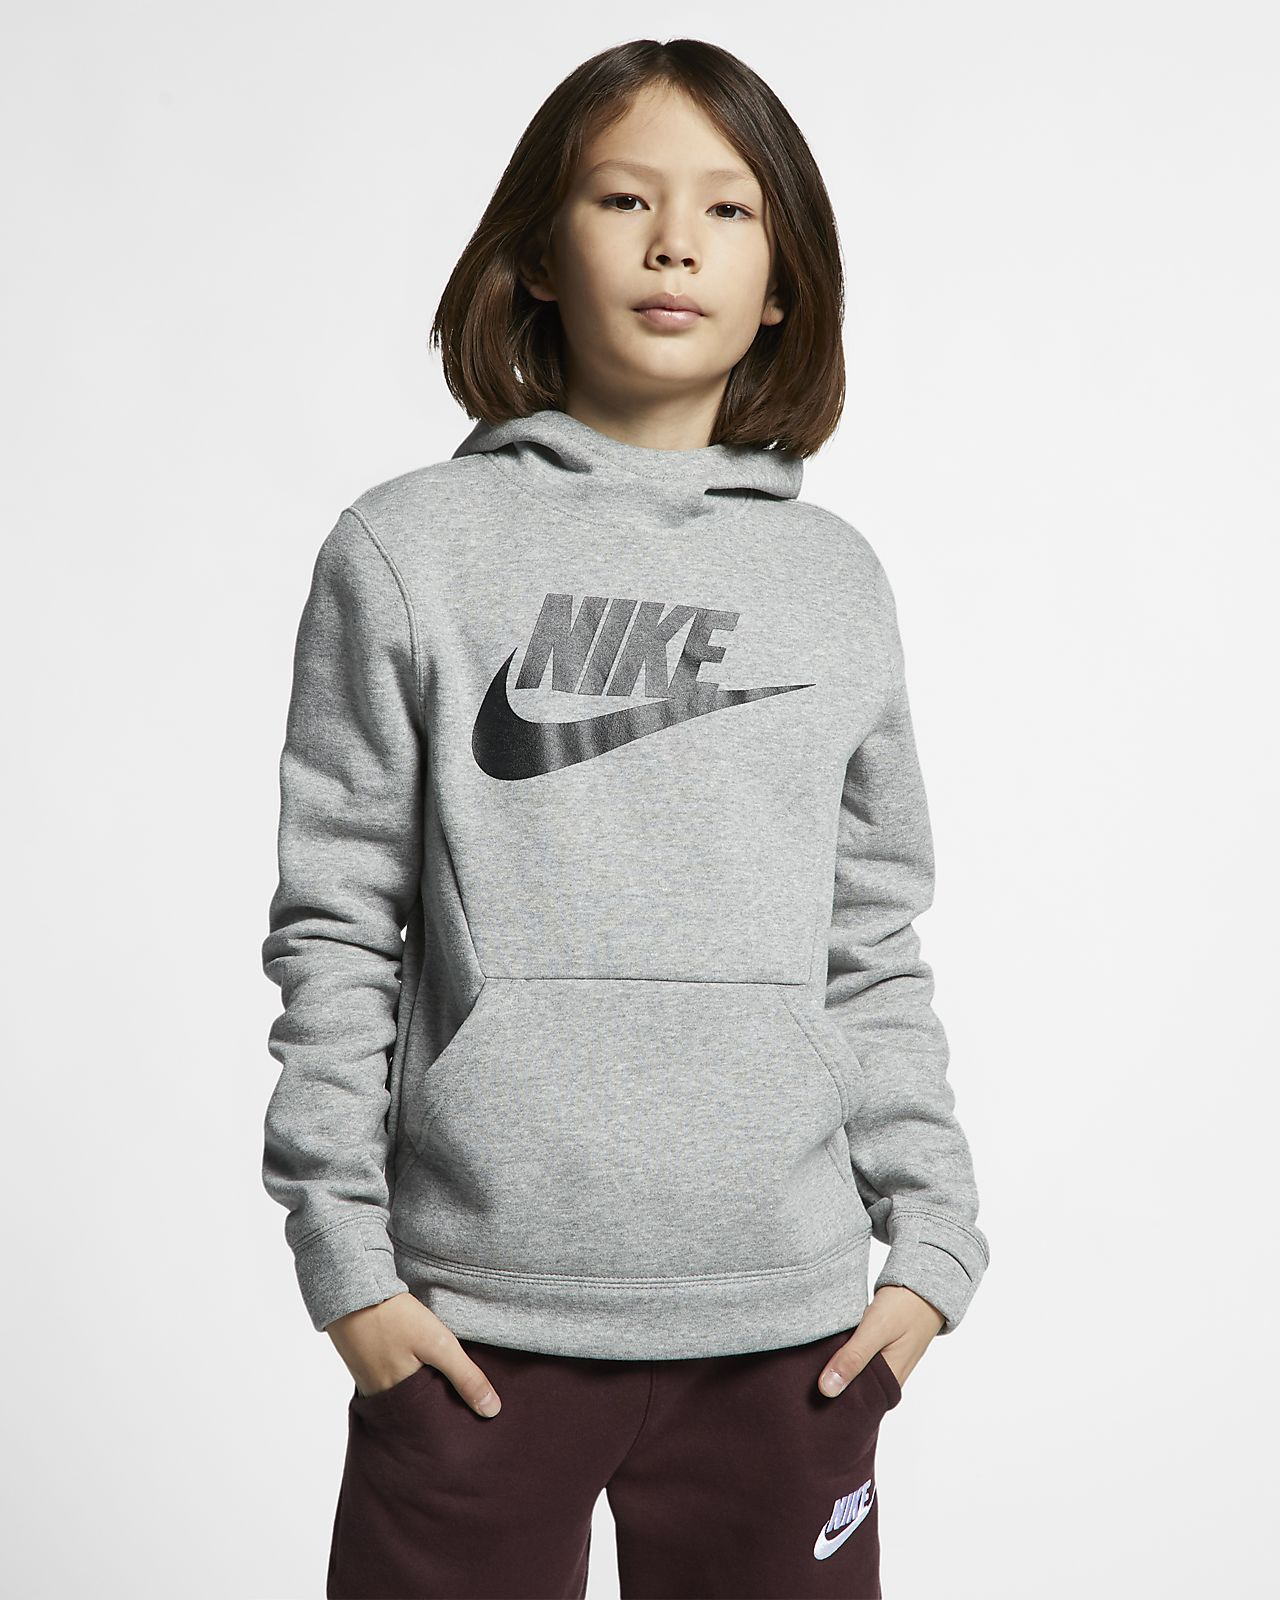 Nike Sportswear Dessuadora amb caputxa de teixit Fleece - Nen/a